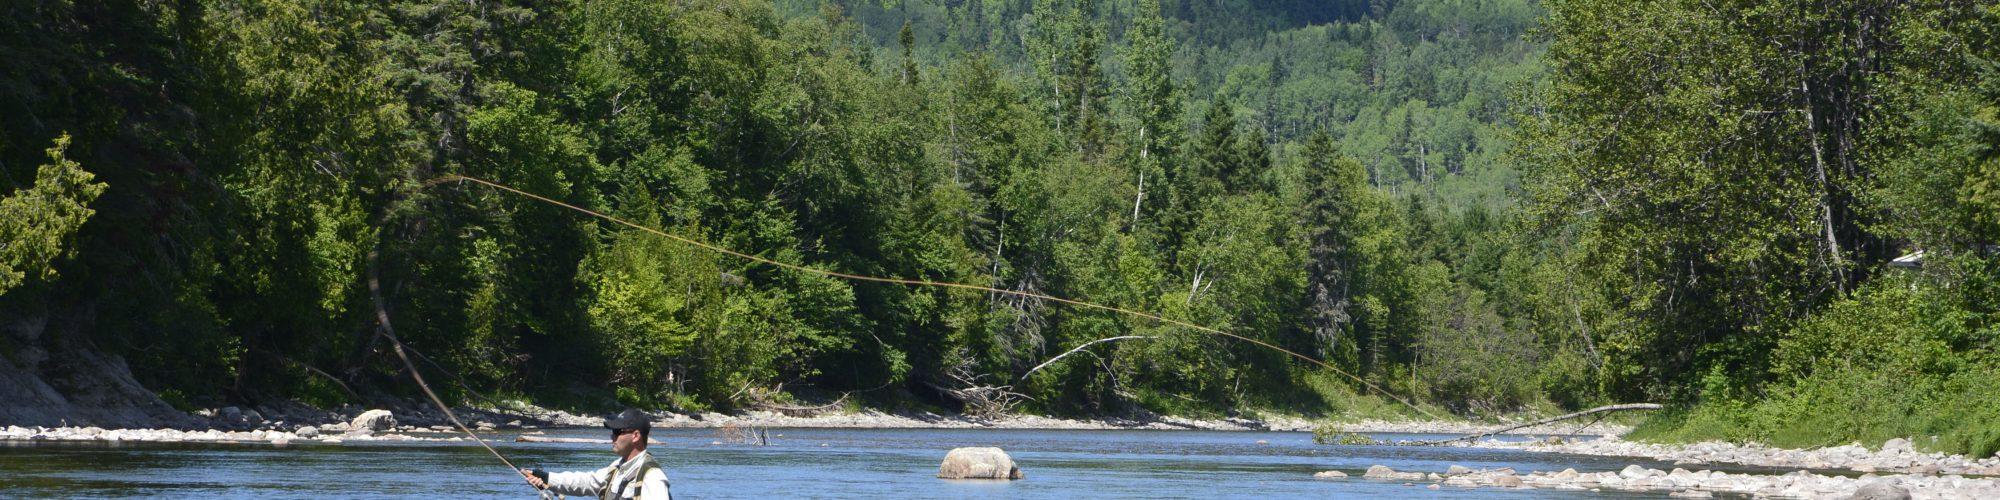 Pêcheur rivière matane